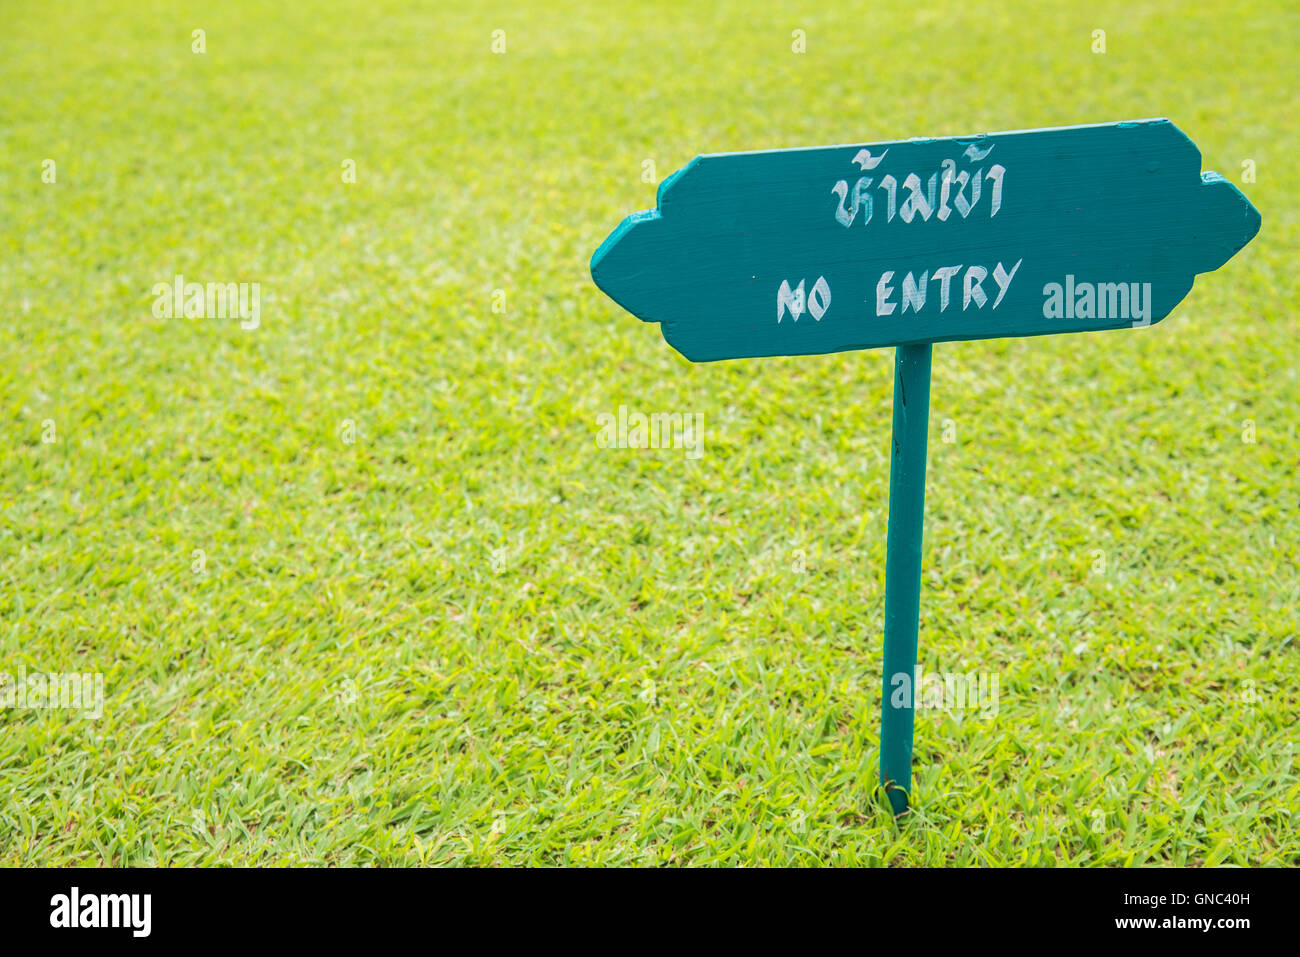 Wooden sign NO ENTRY in green grass garden - Stock Image